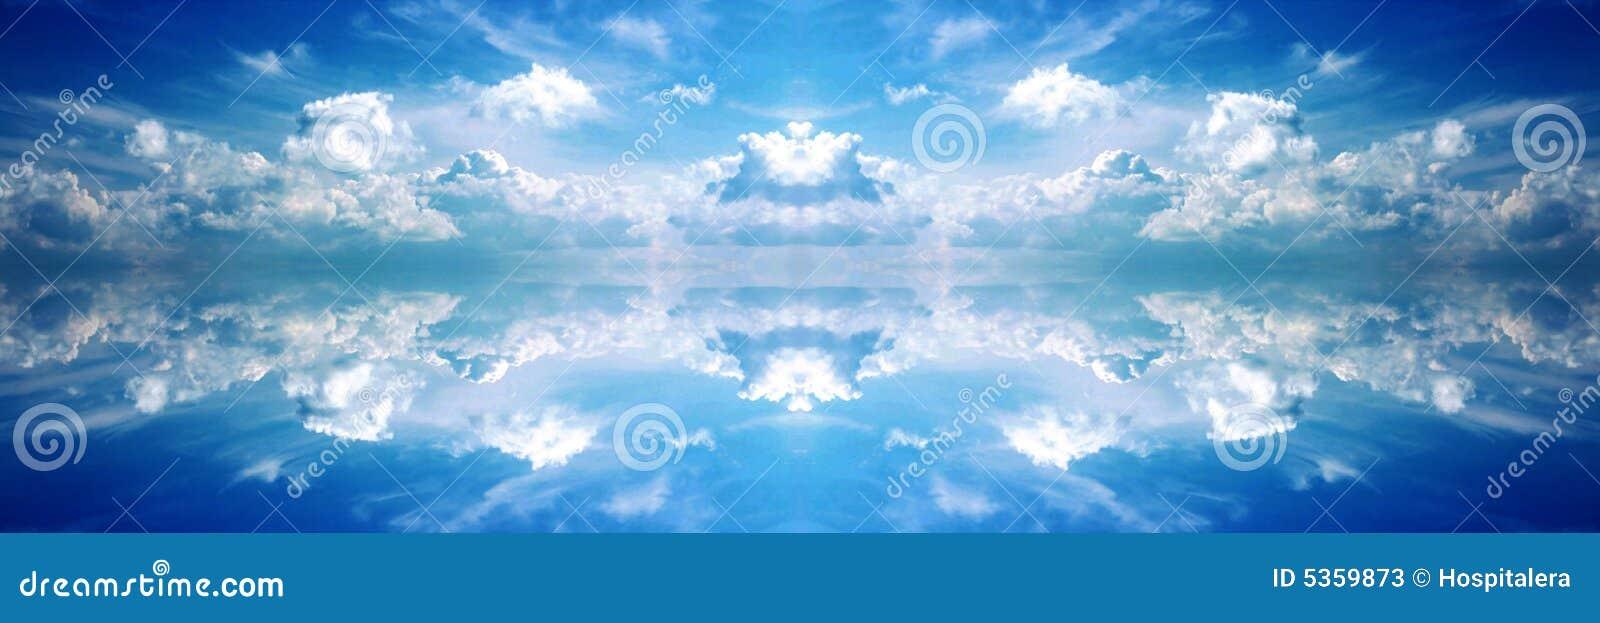 Heavenly Banner Dark 2 Stock Photos - Image: 5359873